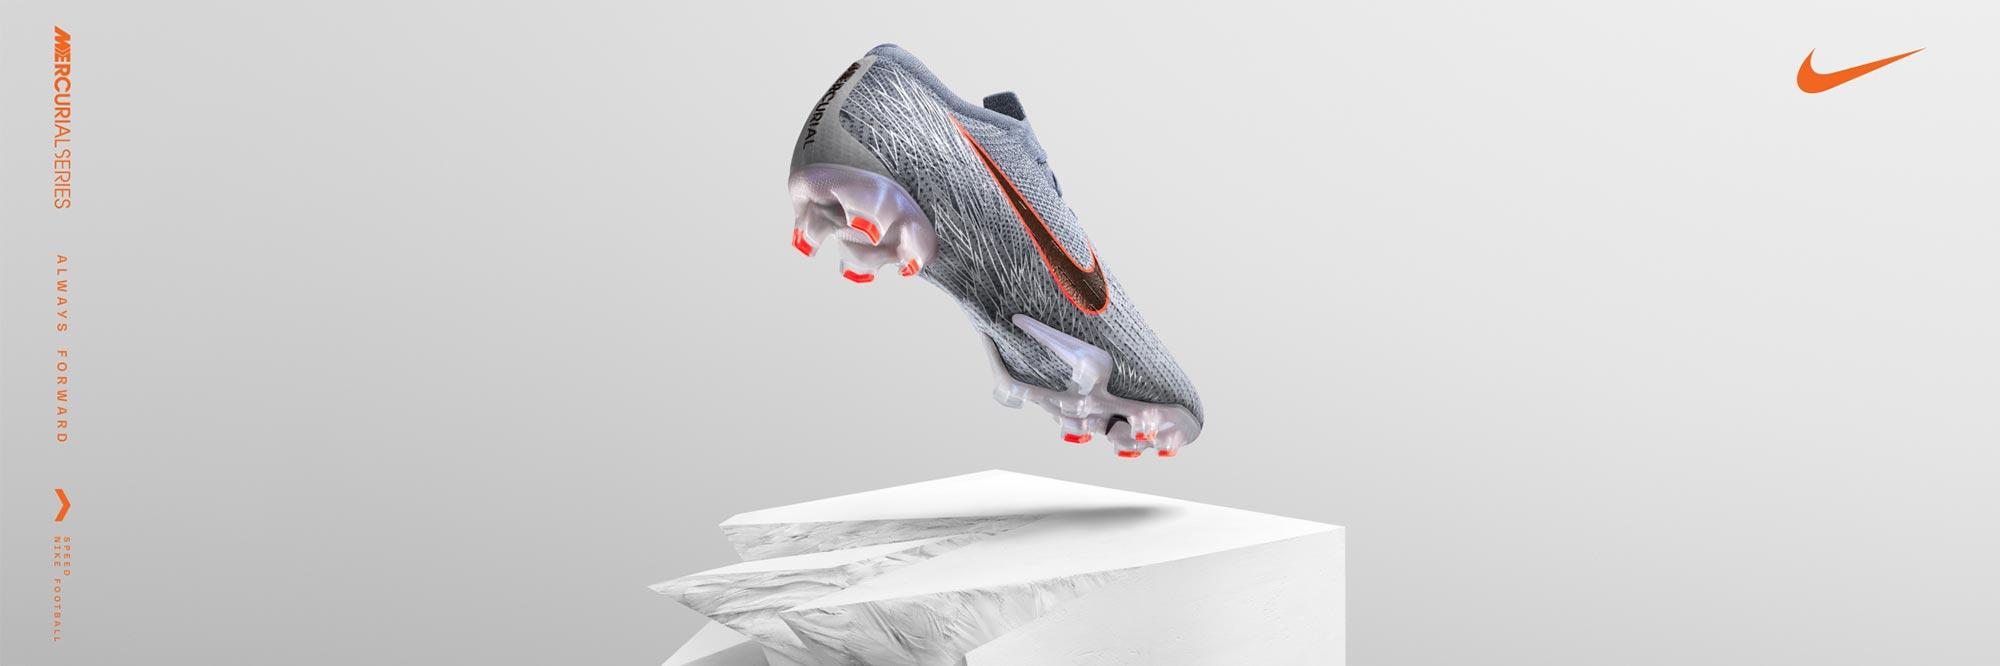 1ee61af77971 Buy Nike® Mercurial Vapor™ | SoccerPro.com